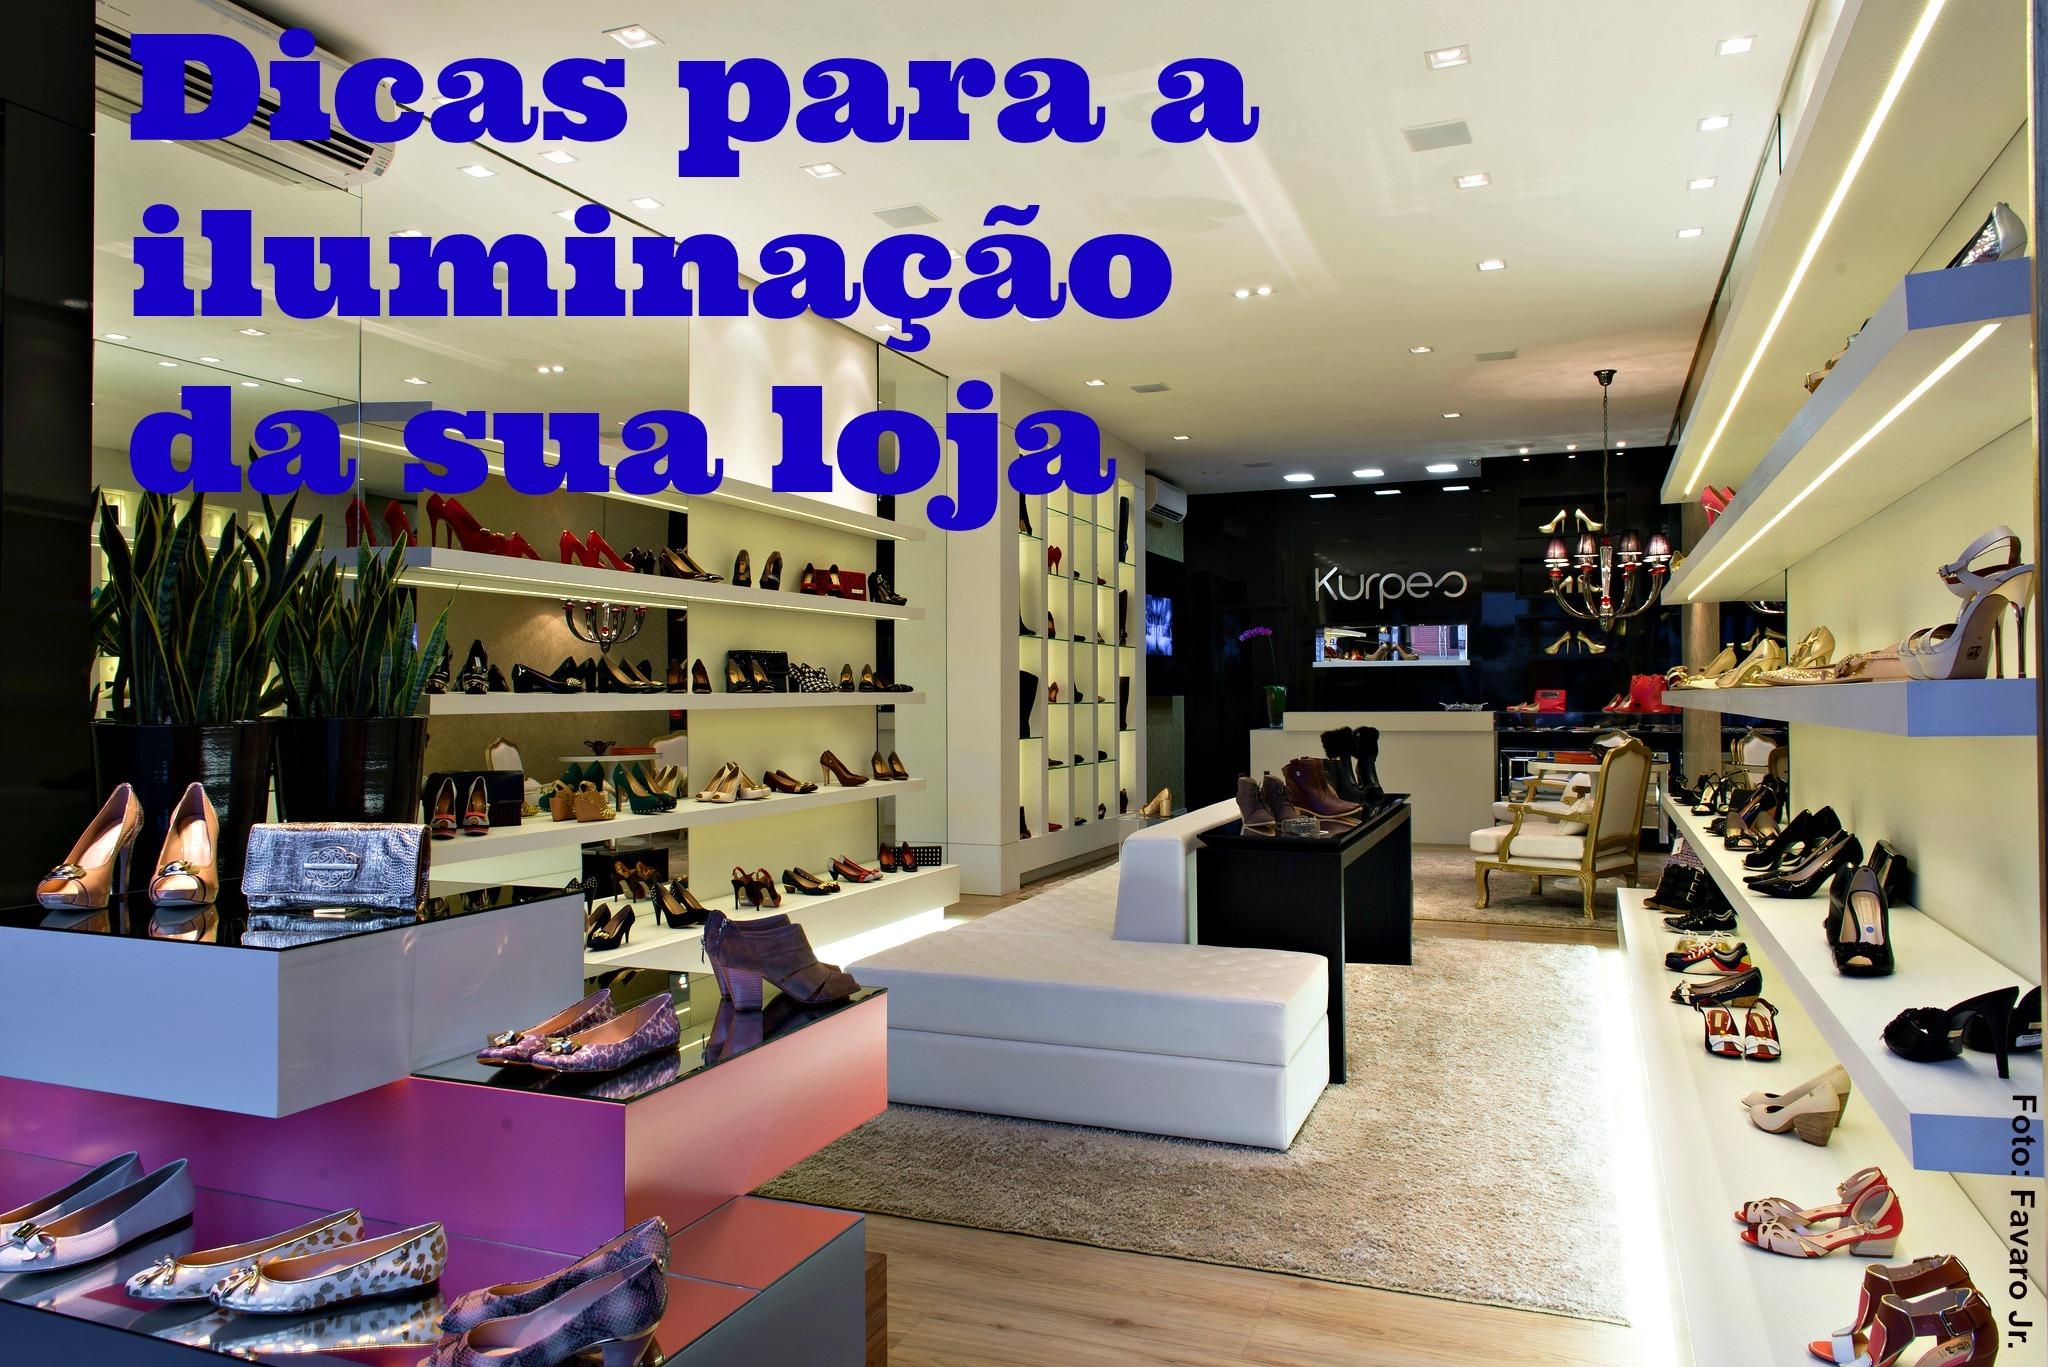 int_iluminacao_loja_pt2